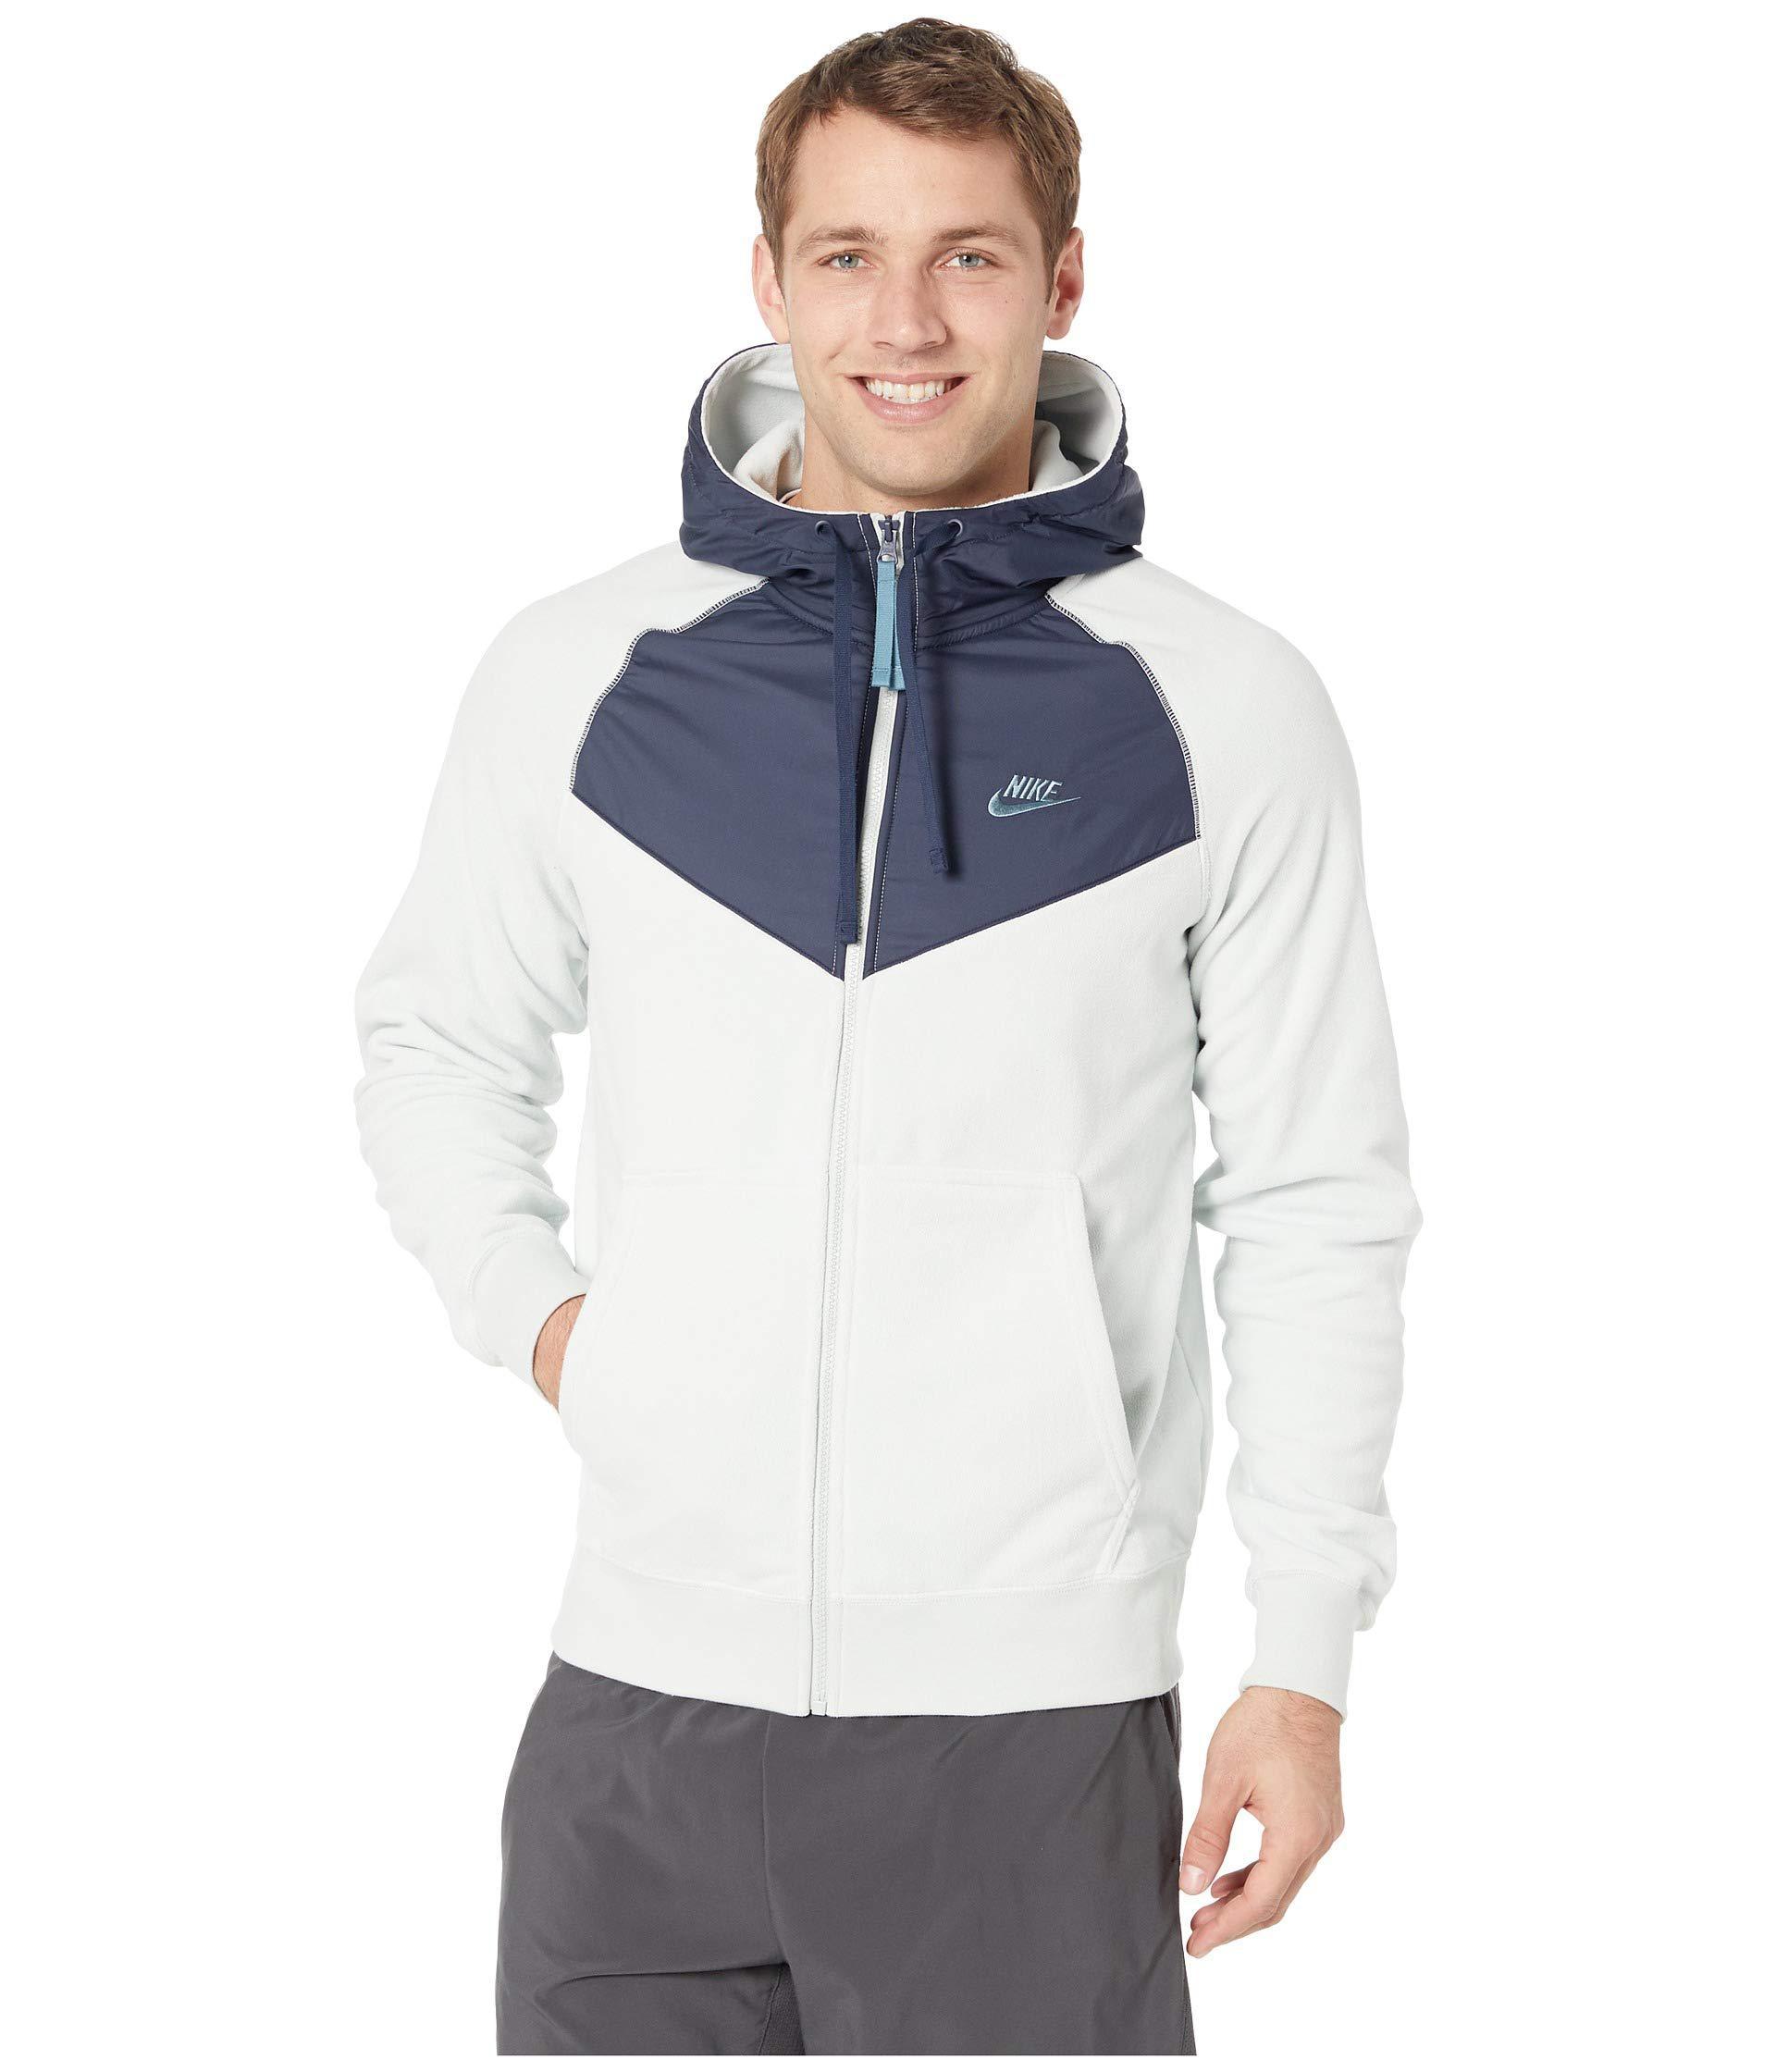 483a38808aa8 Lyst - Nike Nsw Hoodie Full Zip Core Winter Snl (black black white ...